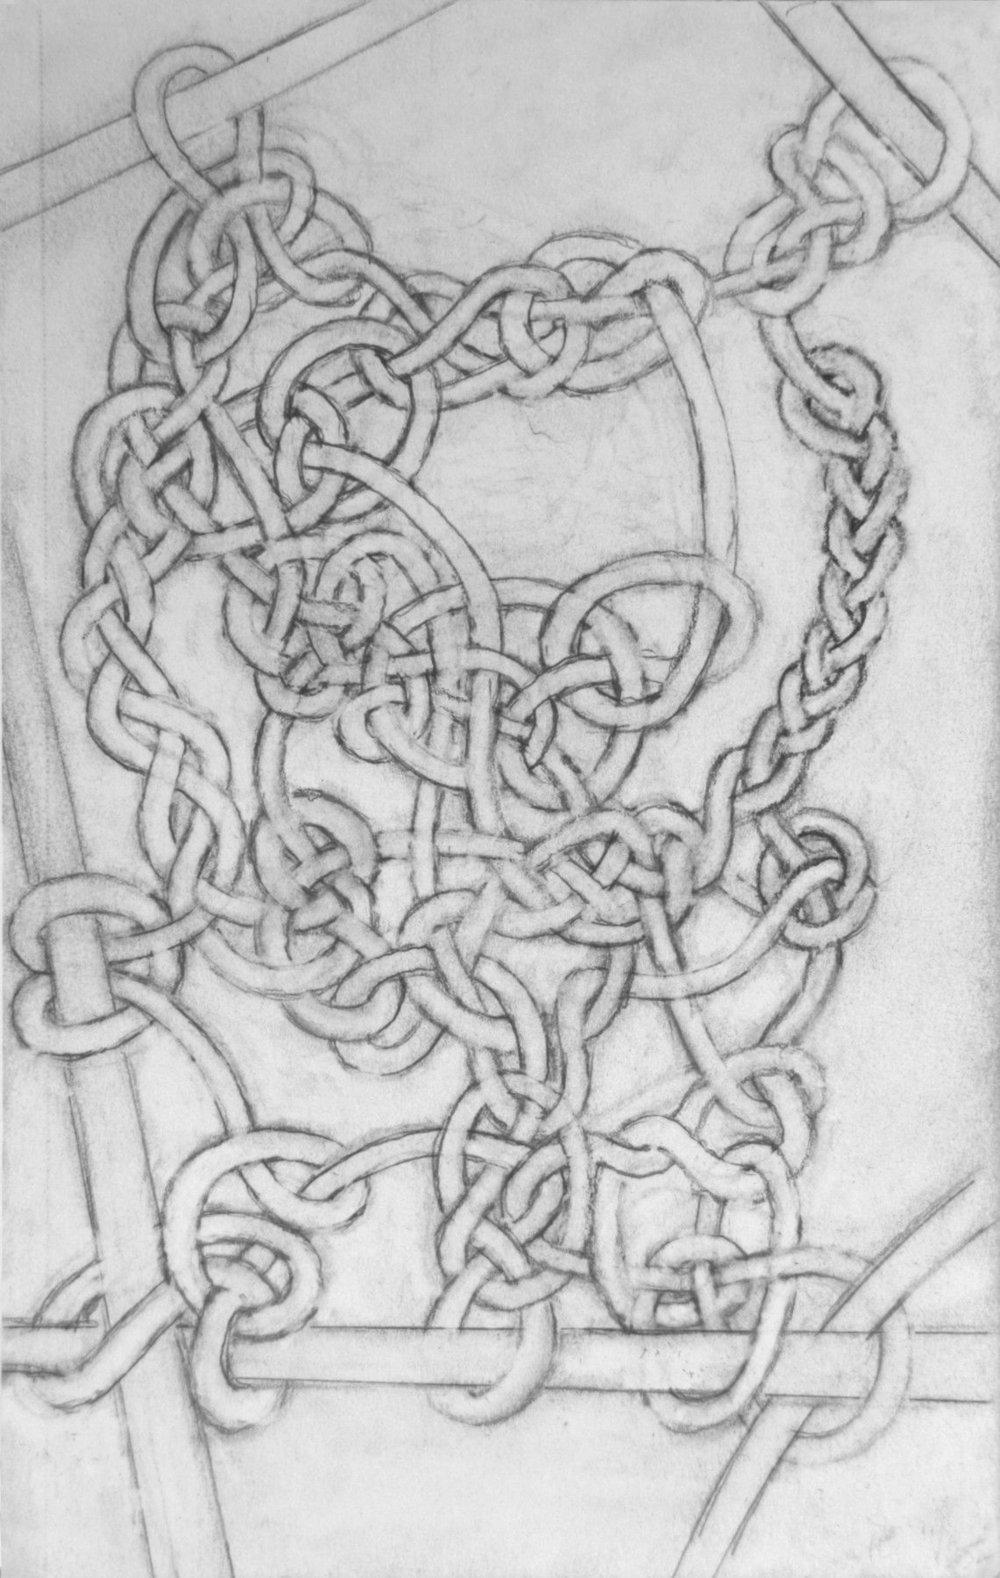 Jim Banks,  Shores of Amaratus , Graphite on paper, 9x6